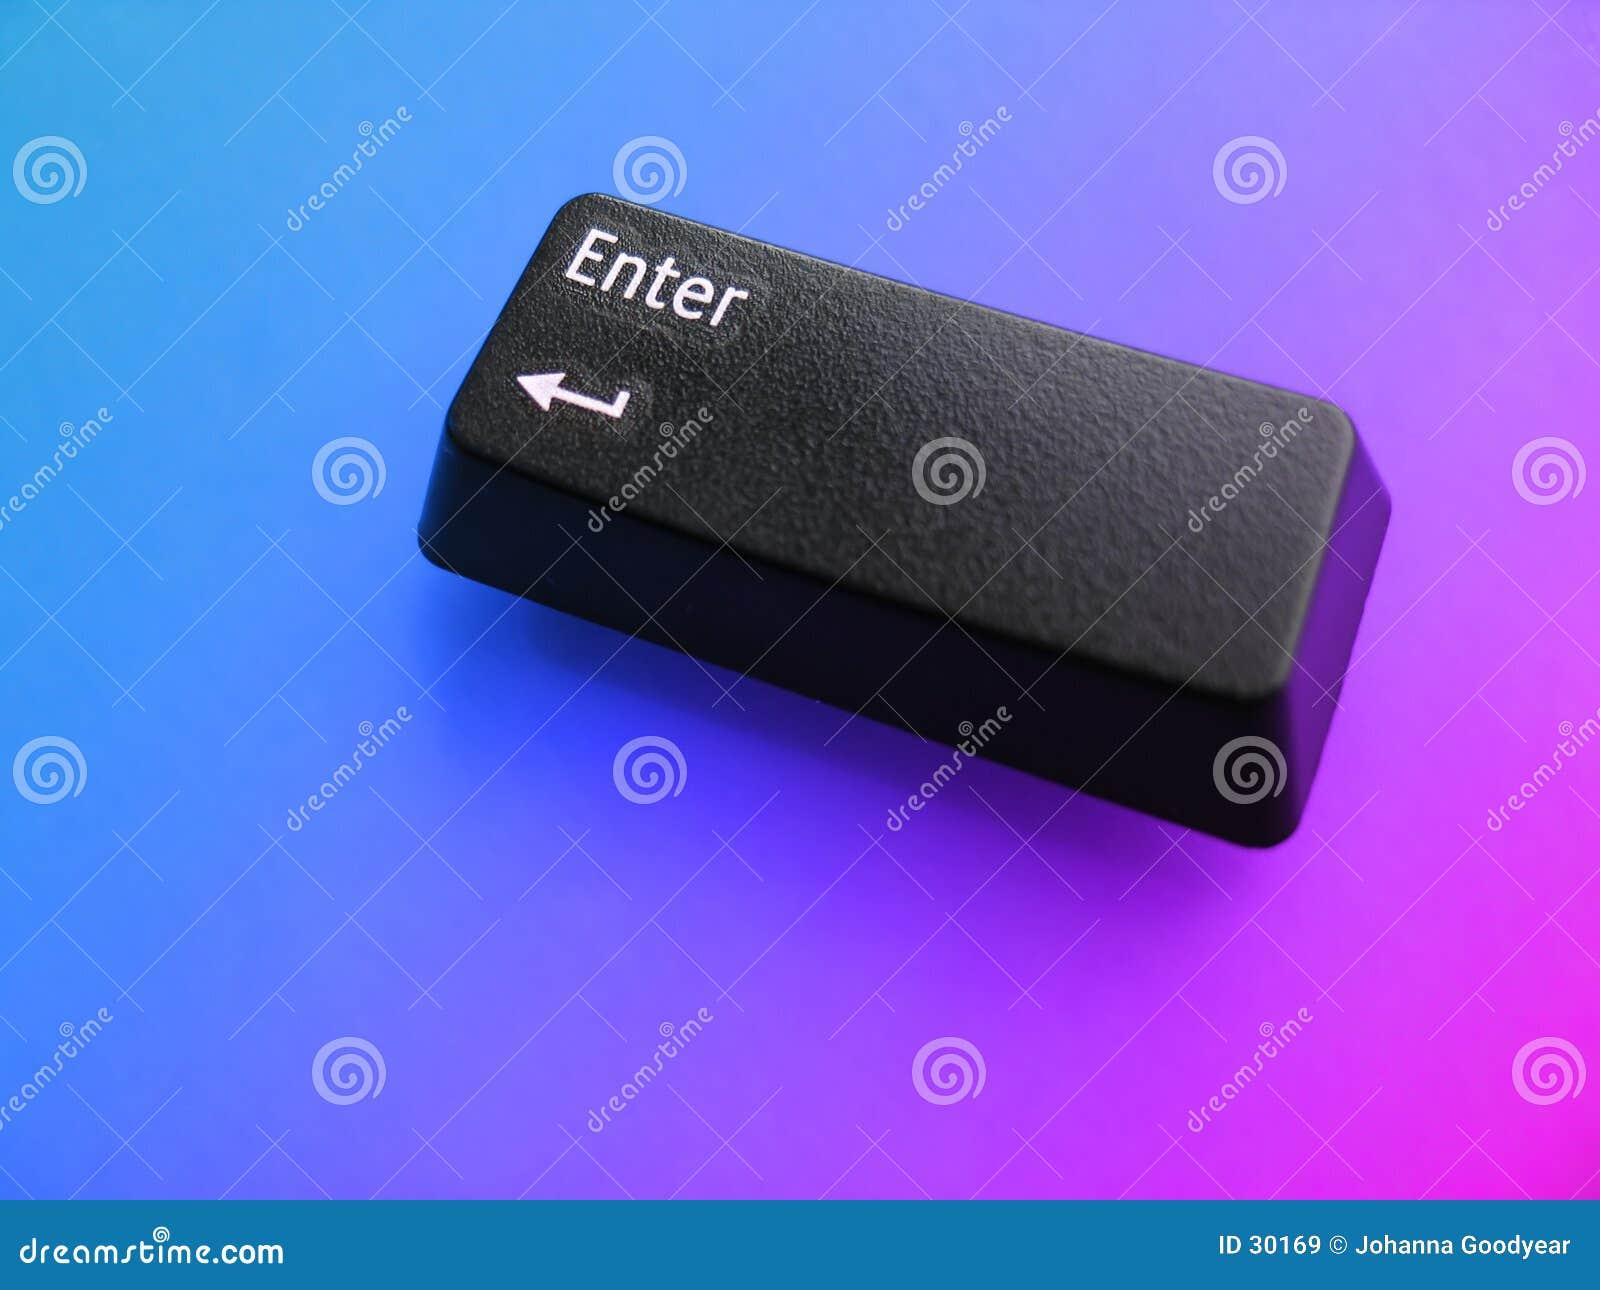 Enter键